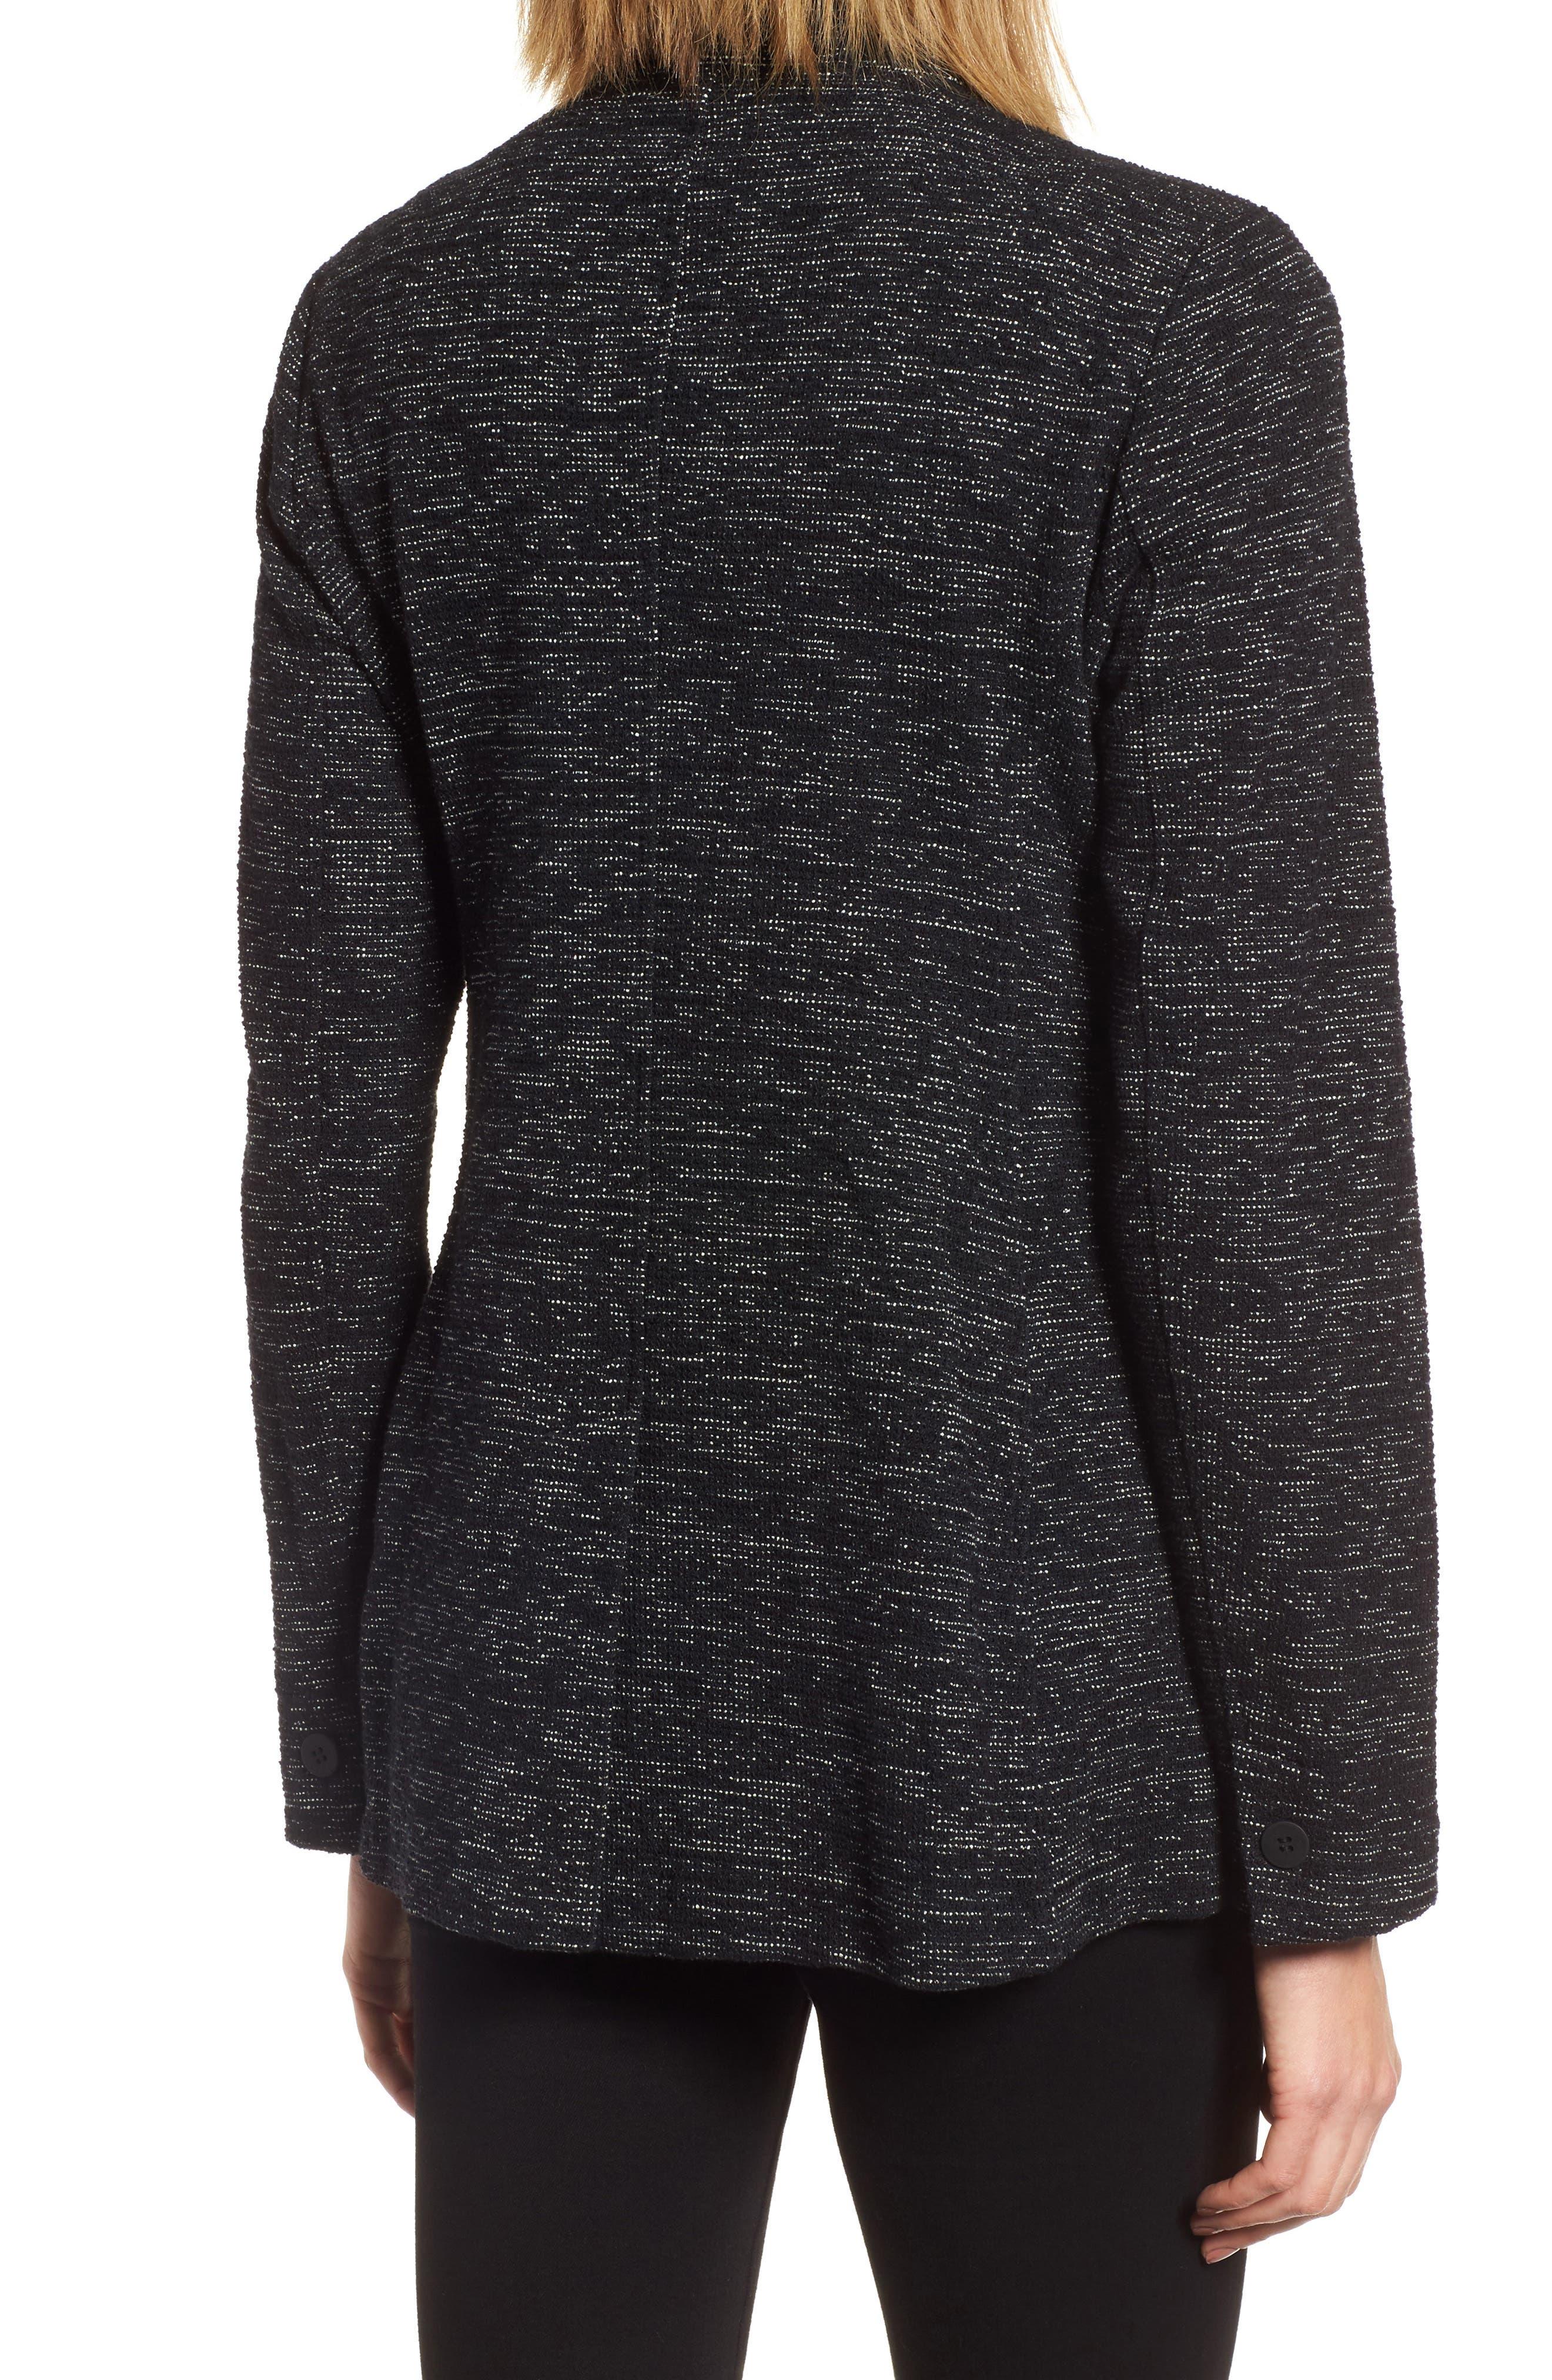 Organic Cotton Blend Tweed Jacket,                             Alternate thumbnail 2, color,